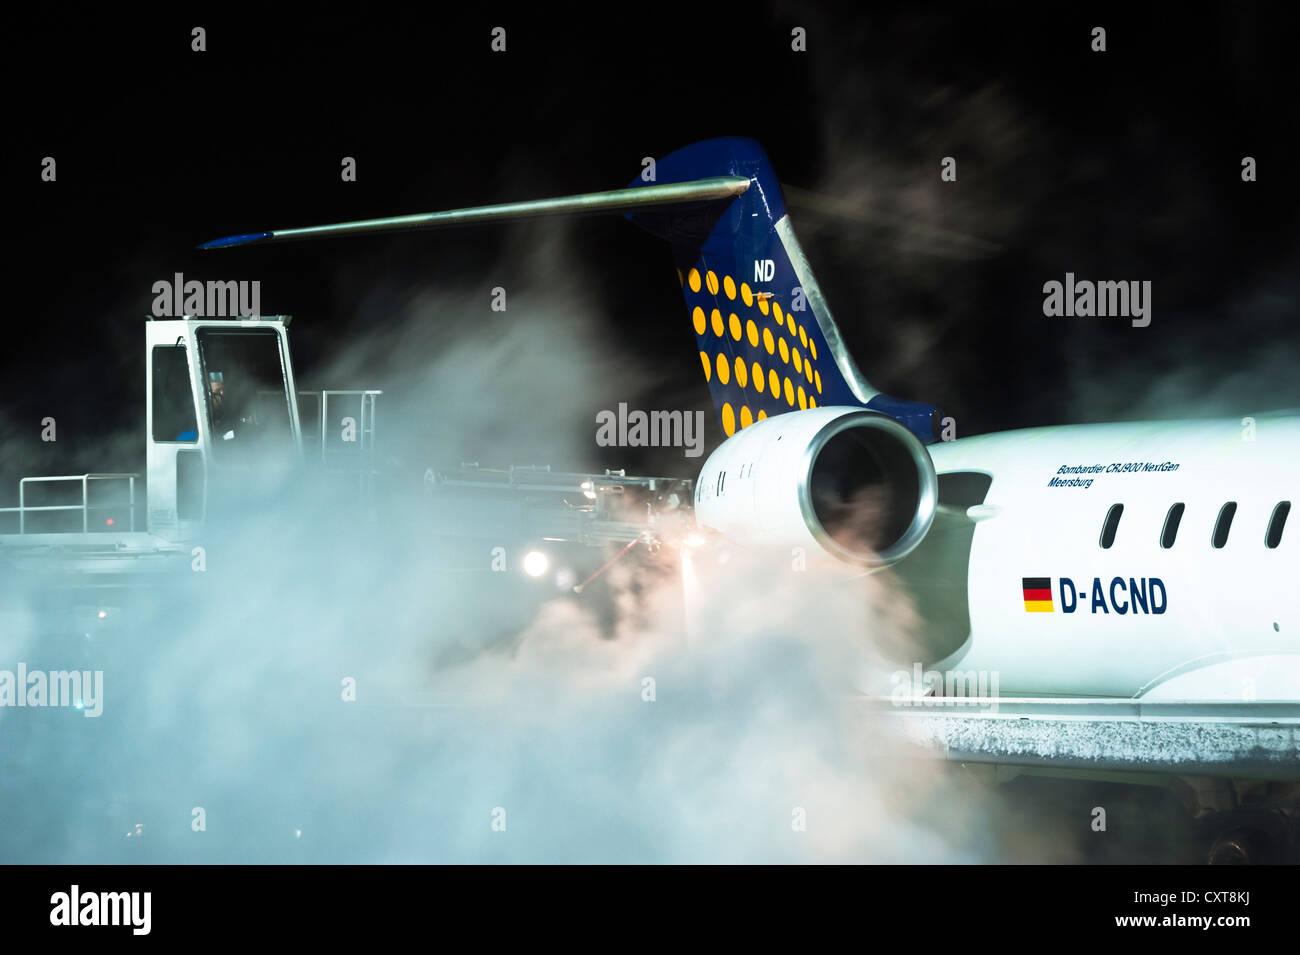 Lufthansa aircraft, Bombardier, being de-iced, Tegel Airport, Berlin - Stock Image